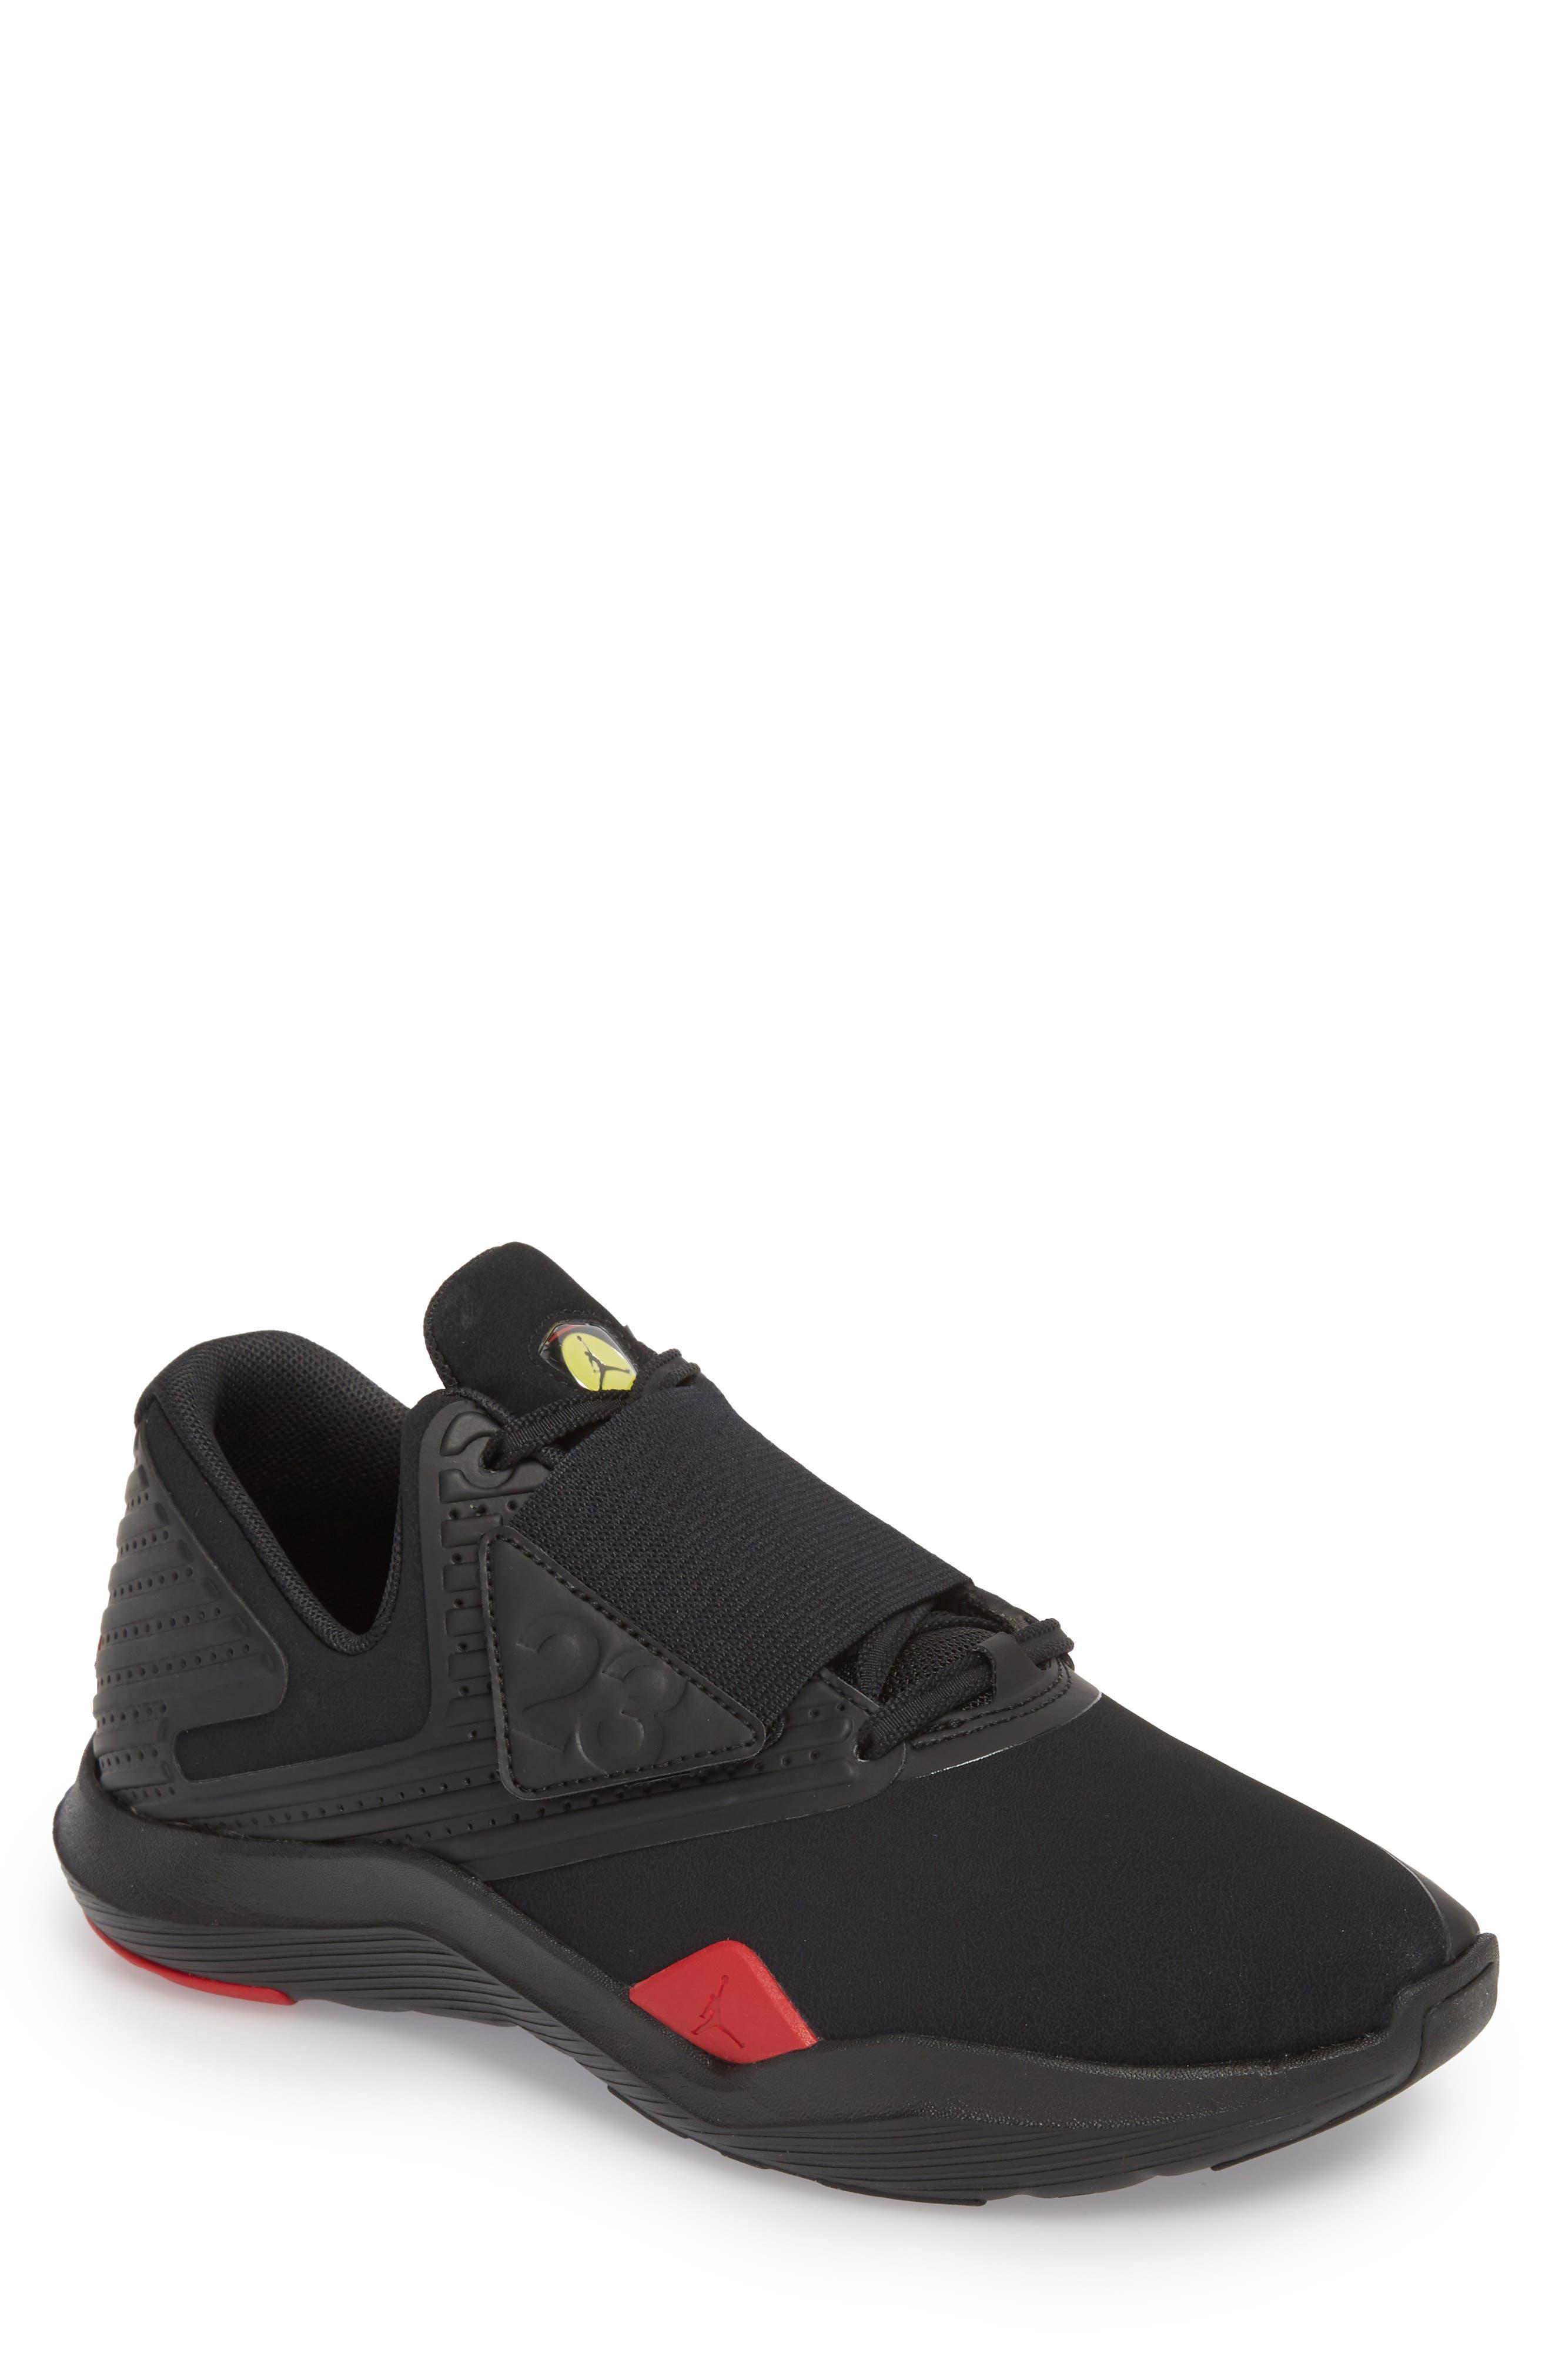 Air Jordan Relentless Training Sneaker,                             Main thumbnail 1, color,                             Black/ Varsity Red/ Dandelion